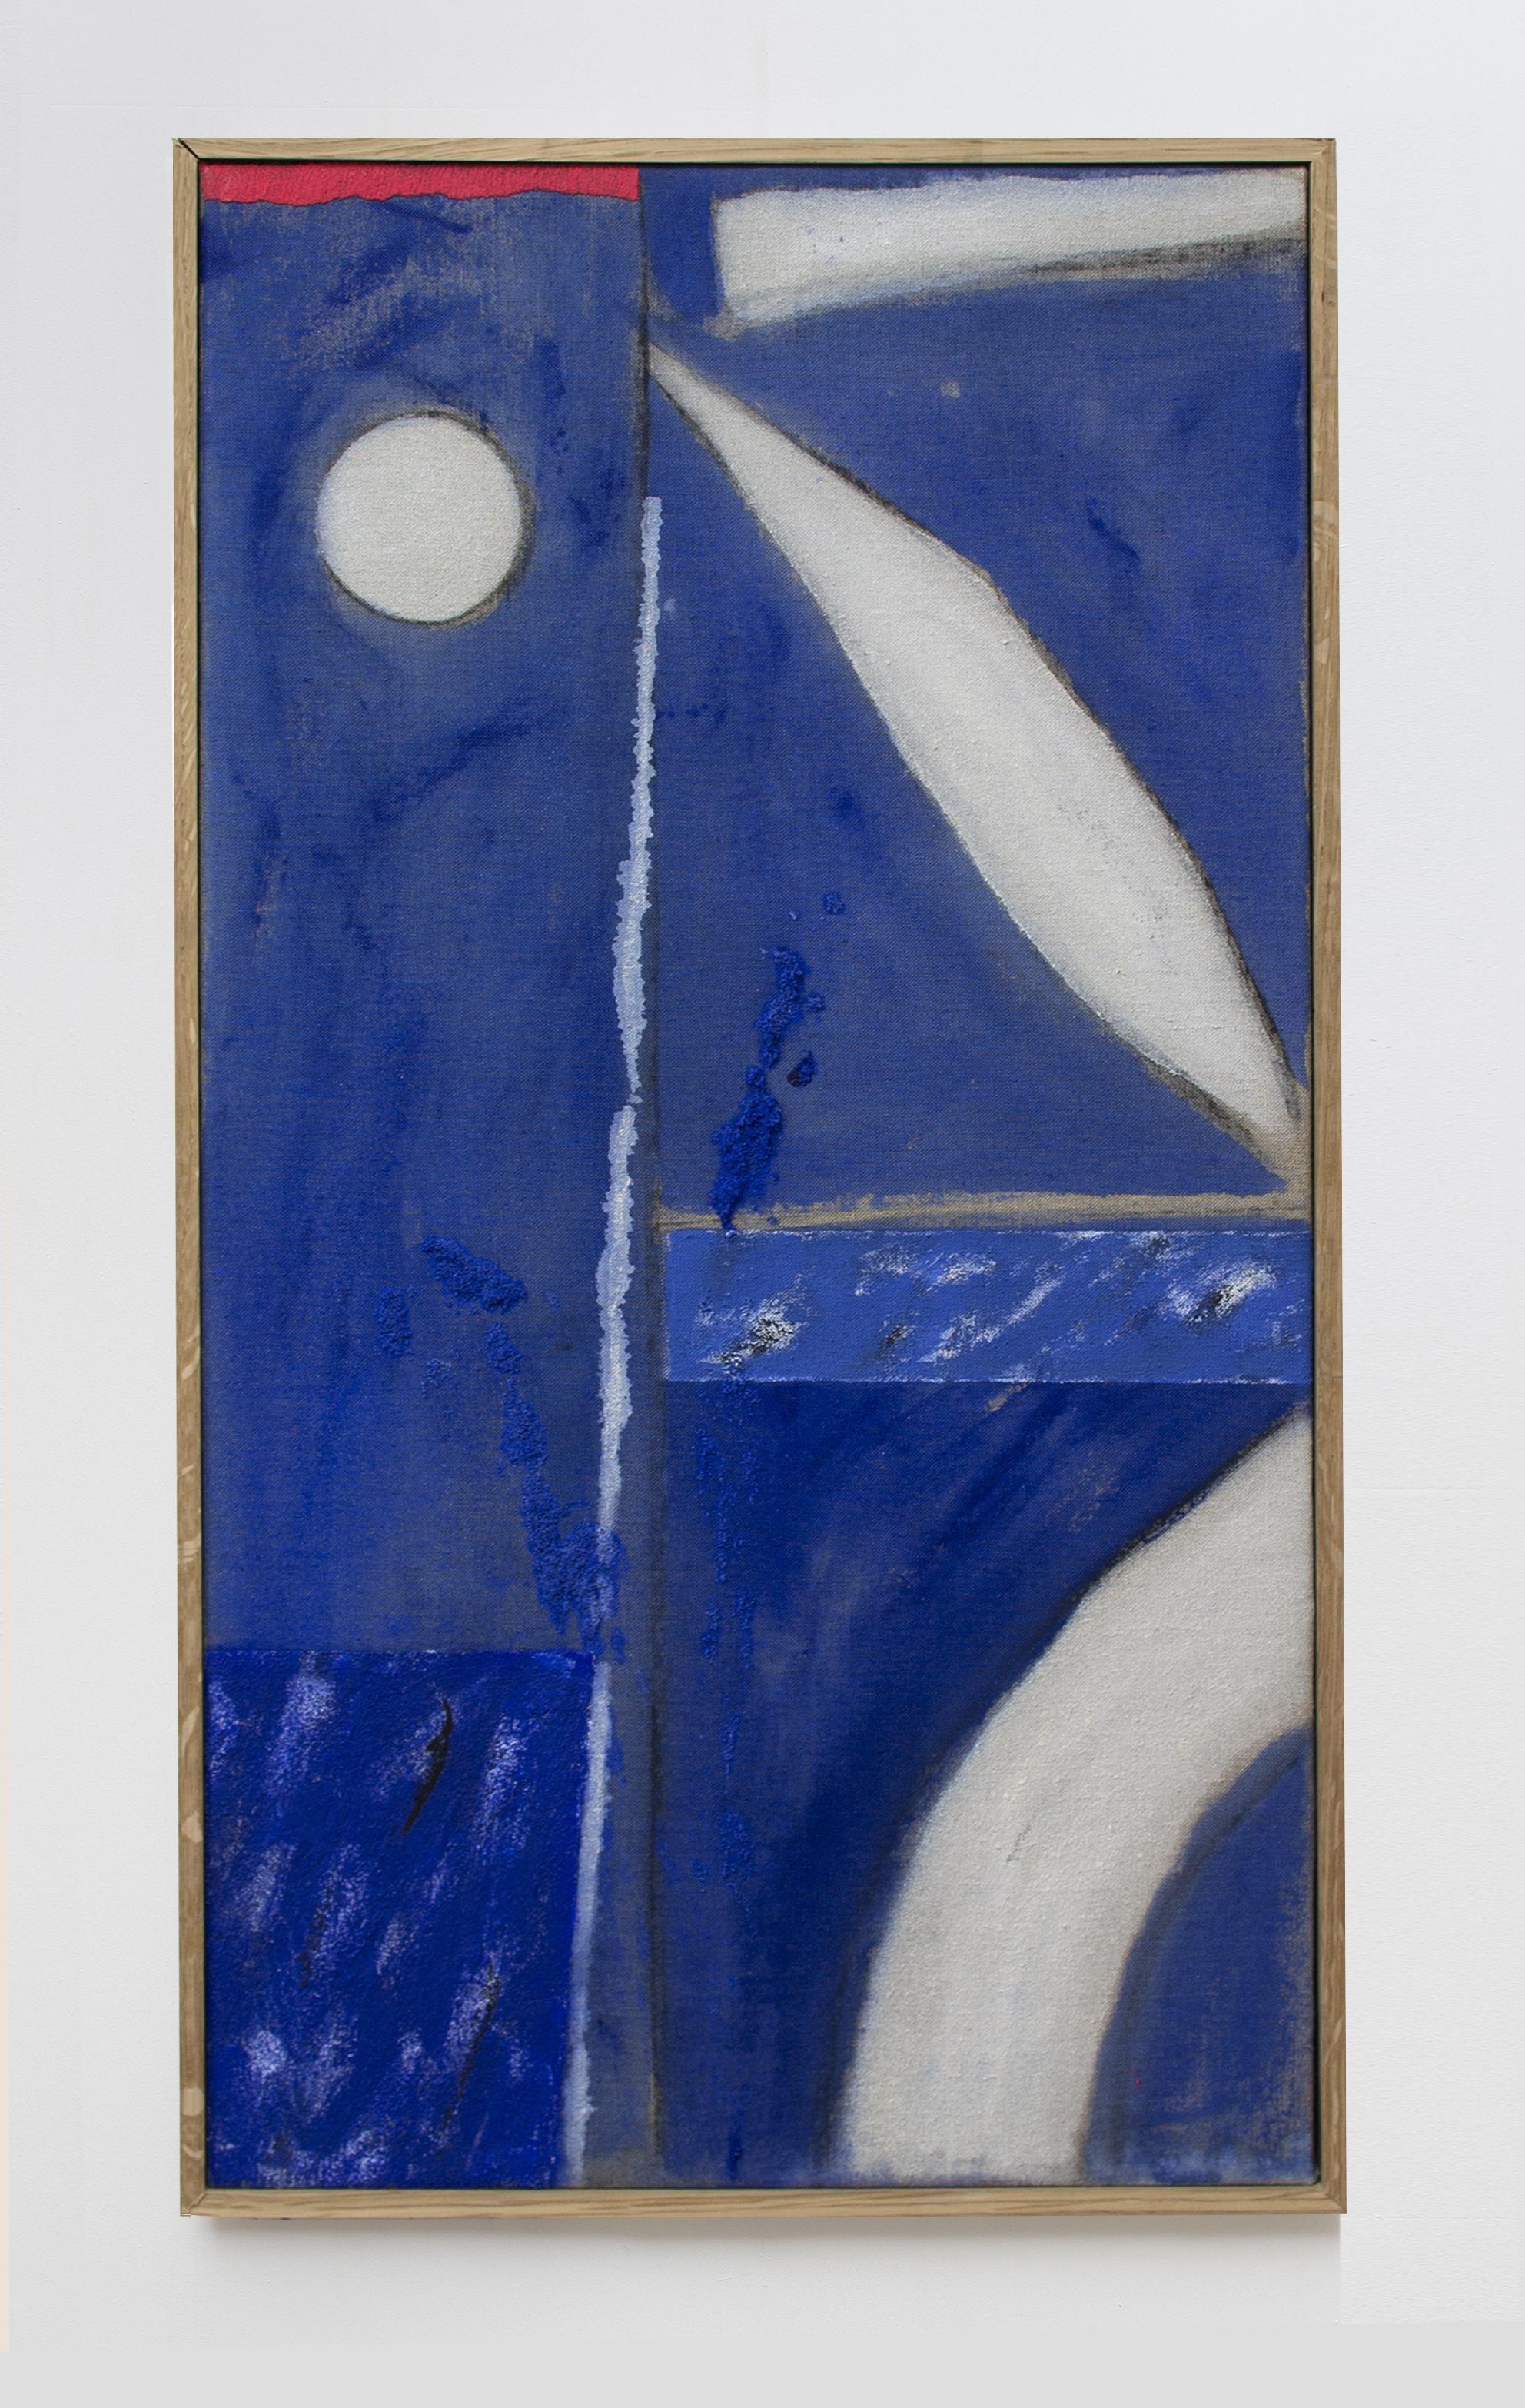 Untitled, 65 x 35 cm